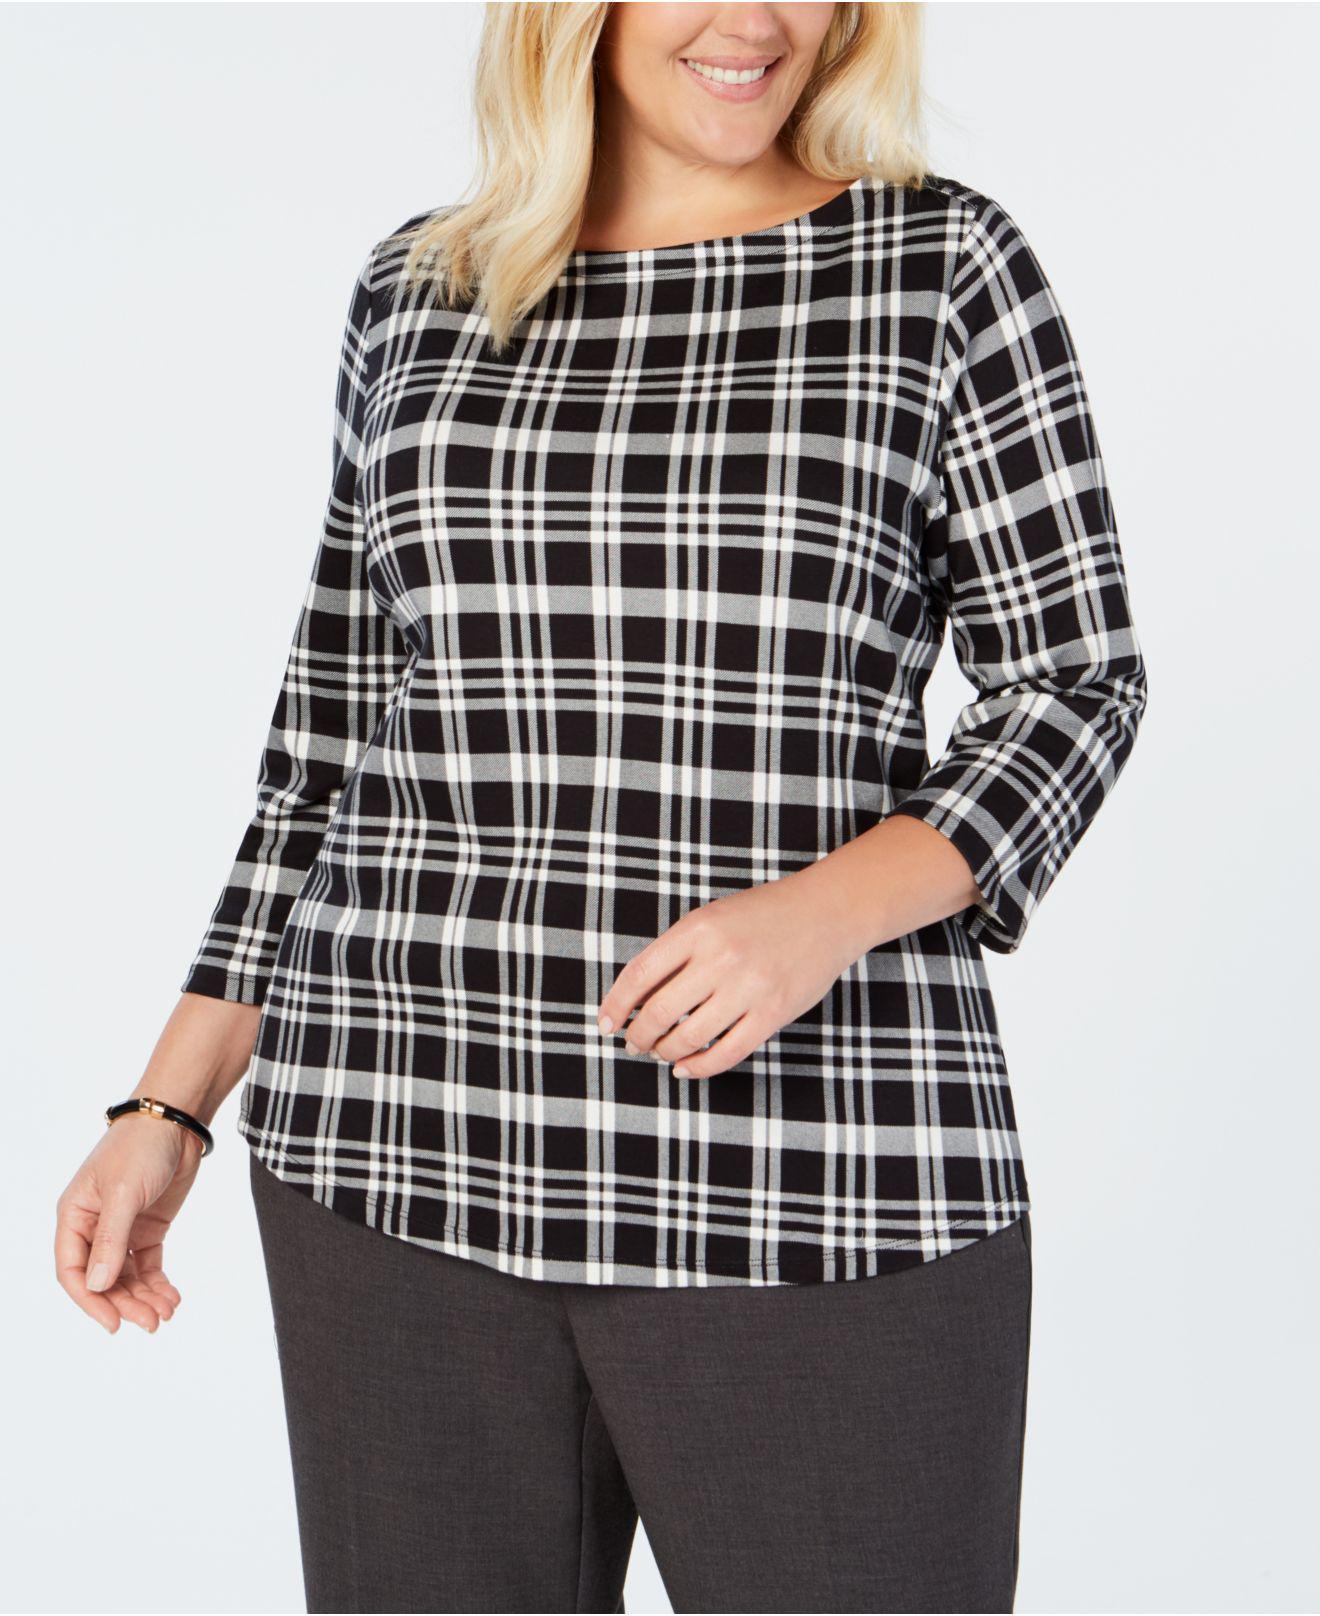 6442dc909e6 Charter Club. Women s Black Plus Size Cotton Printed T-shirt ...